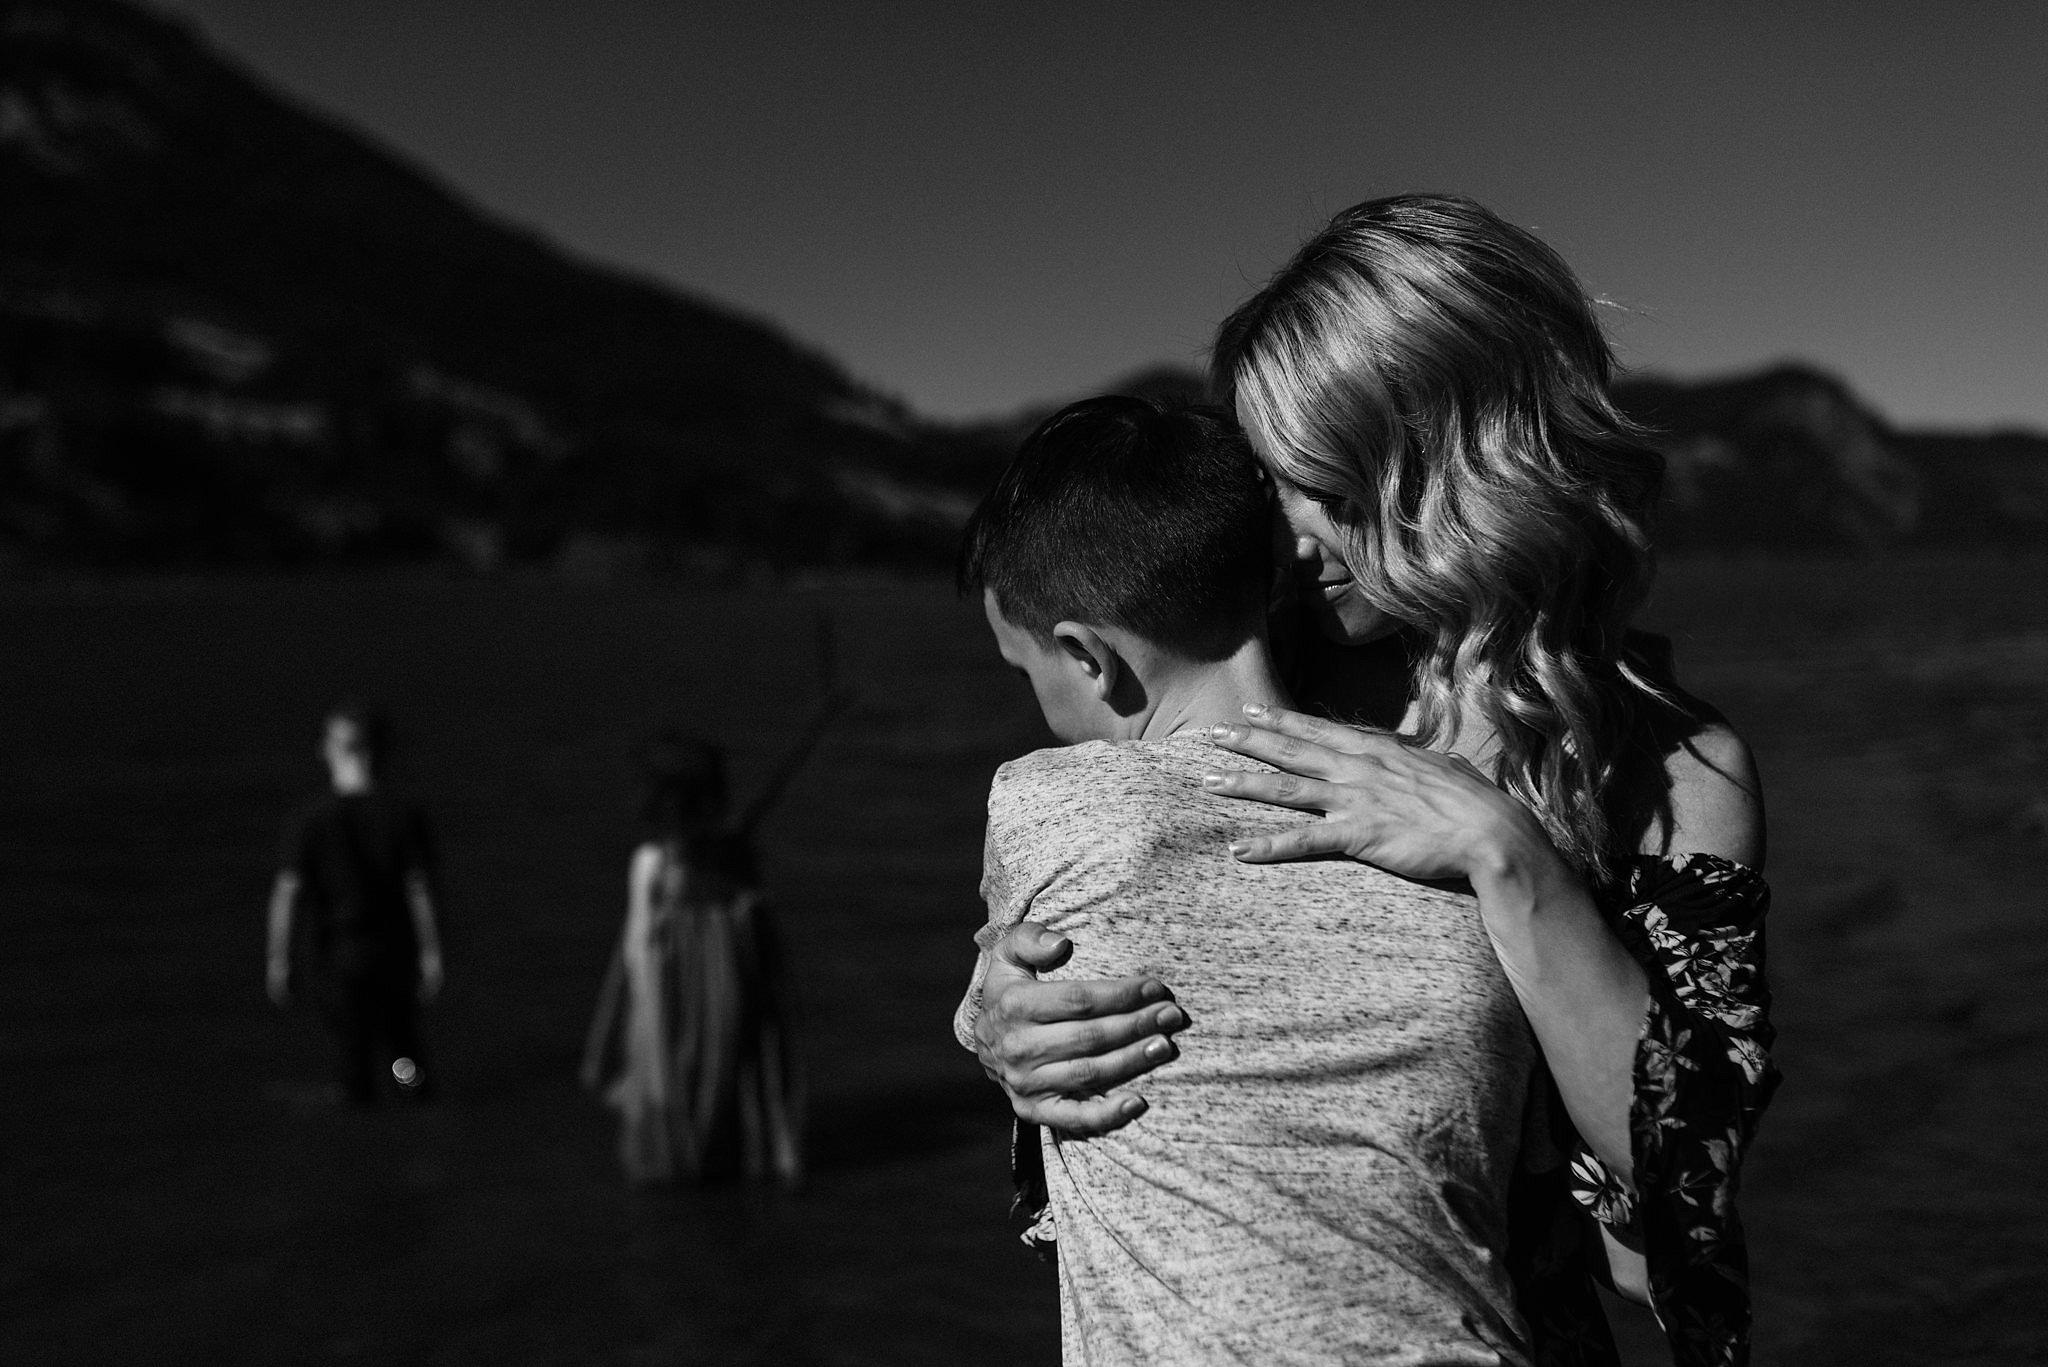 twyla jones photography - treasure coast florida - intimate couples session urban cowboy b&b | brooklyn New York_0051.jpg